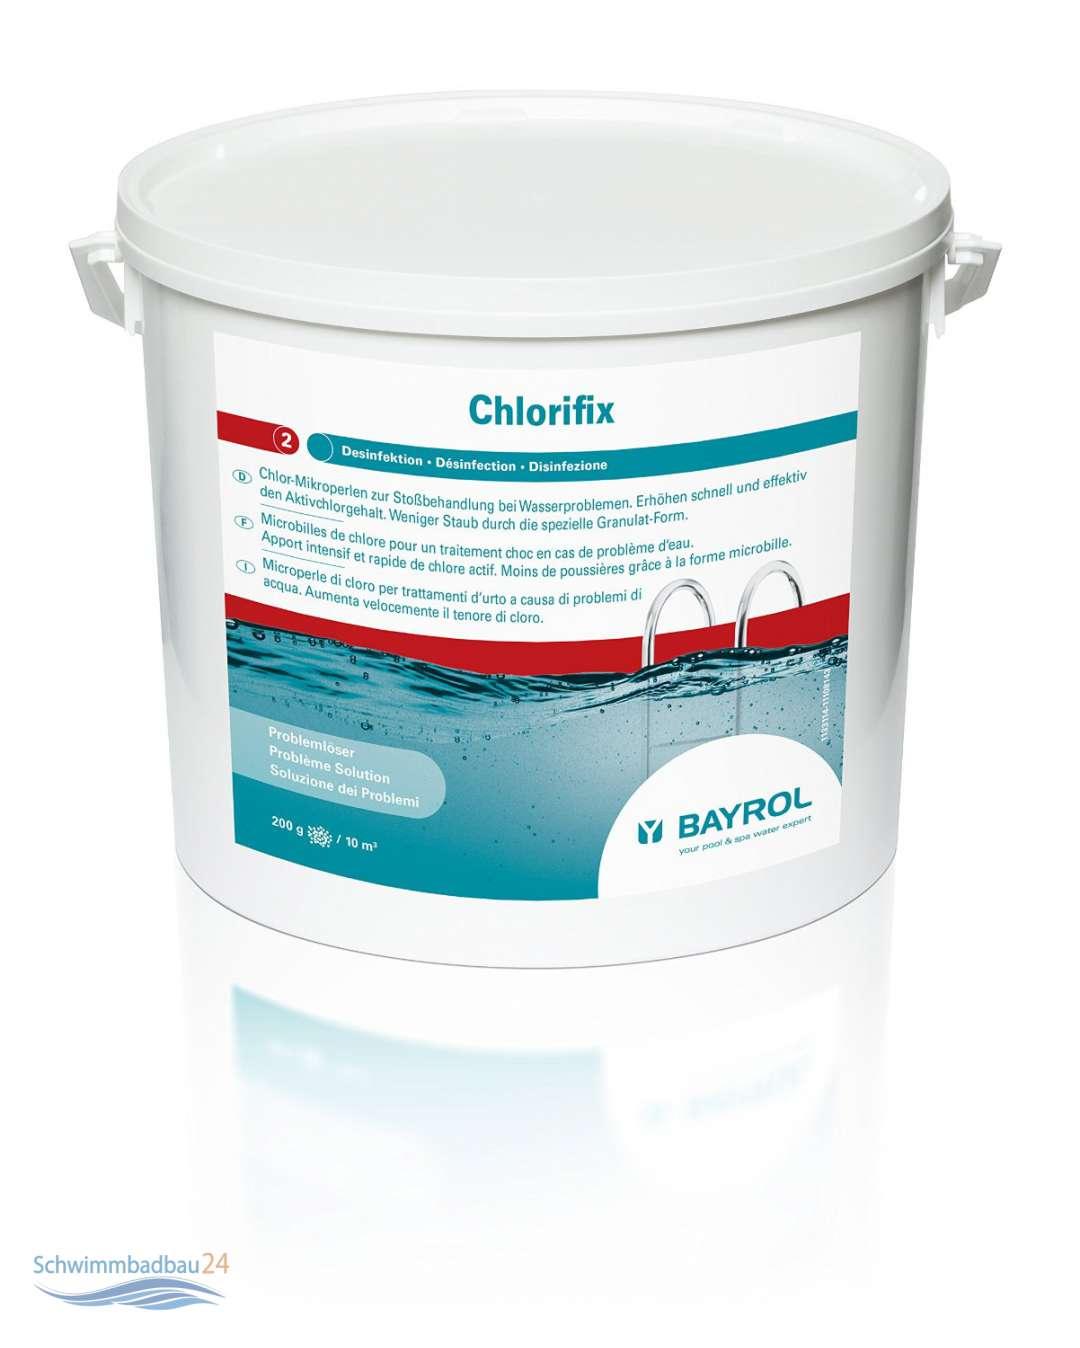 Chlorifix granulat